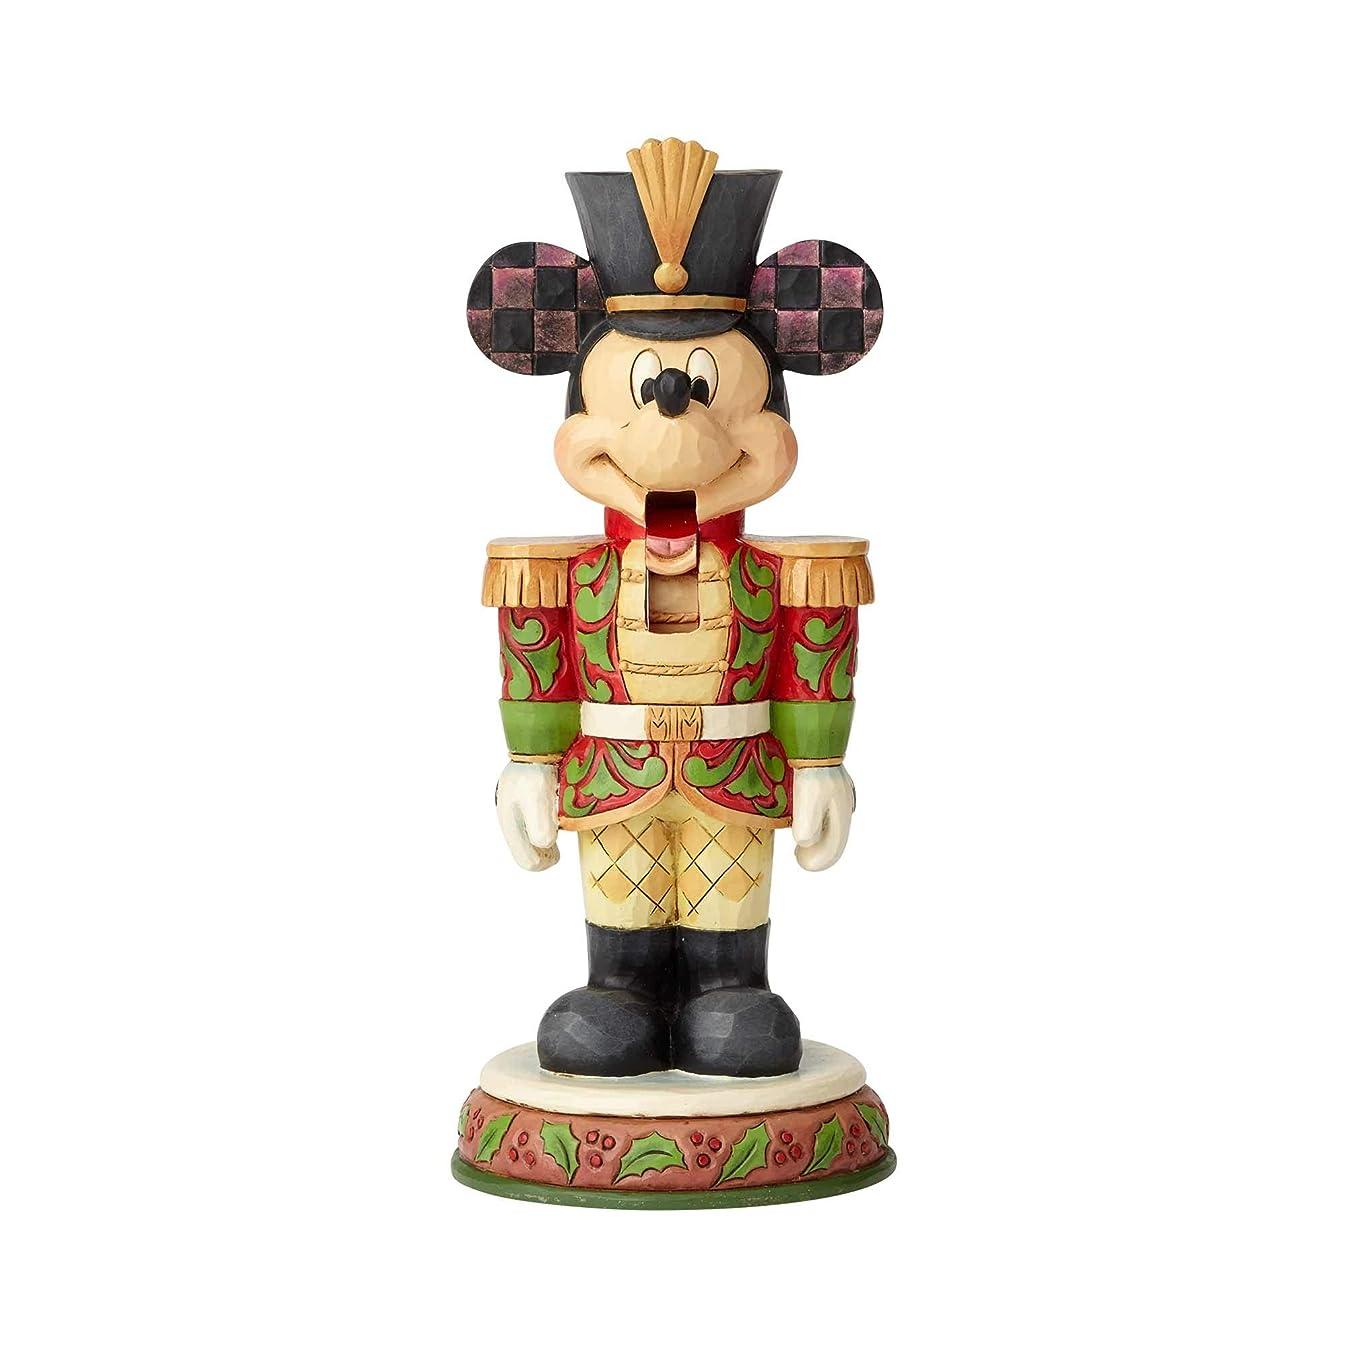 Enesco Disney Traditions by Jim Shore Mickey Mouse Nutcracker Figurine 7